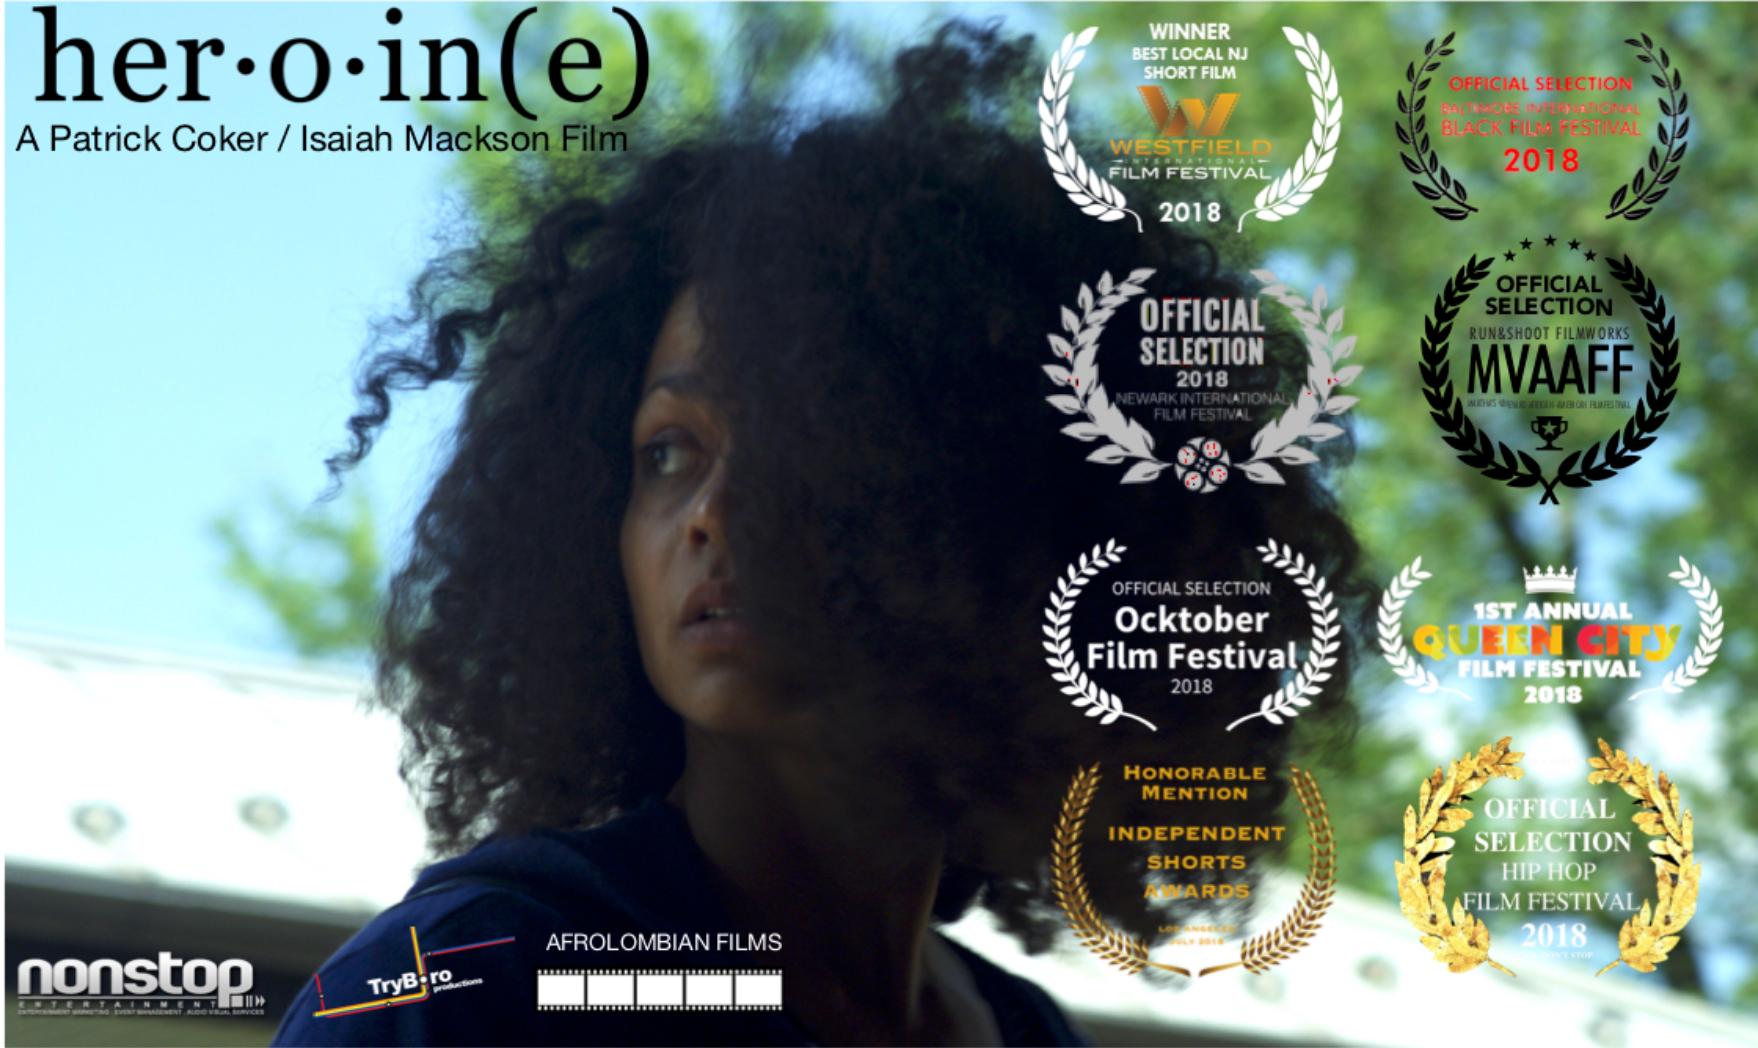 Heroin(e) A Short Film